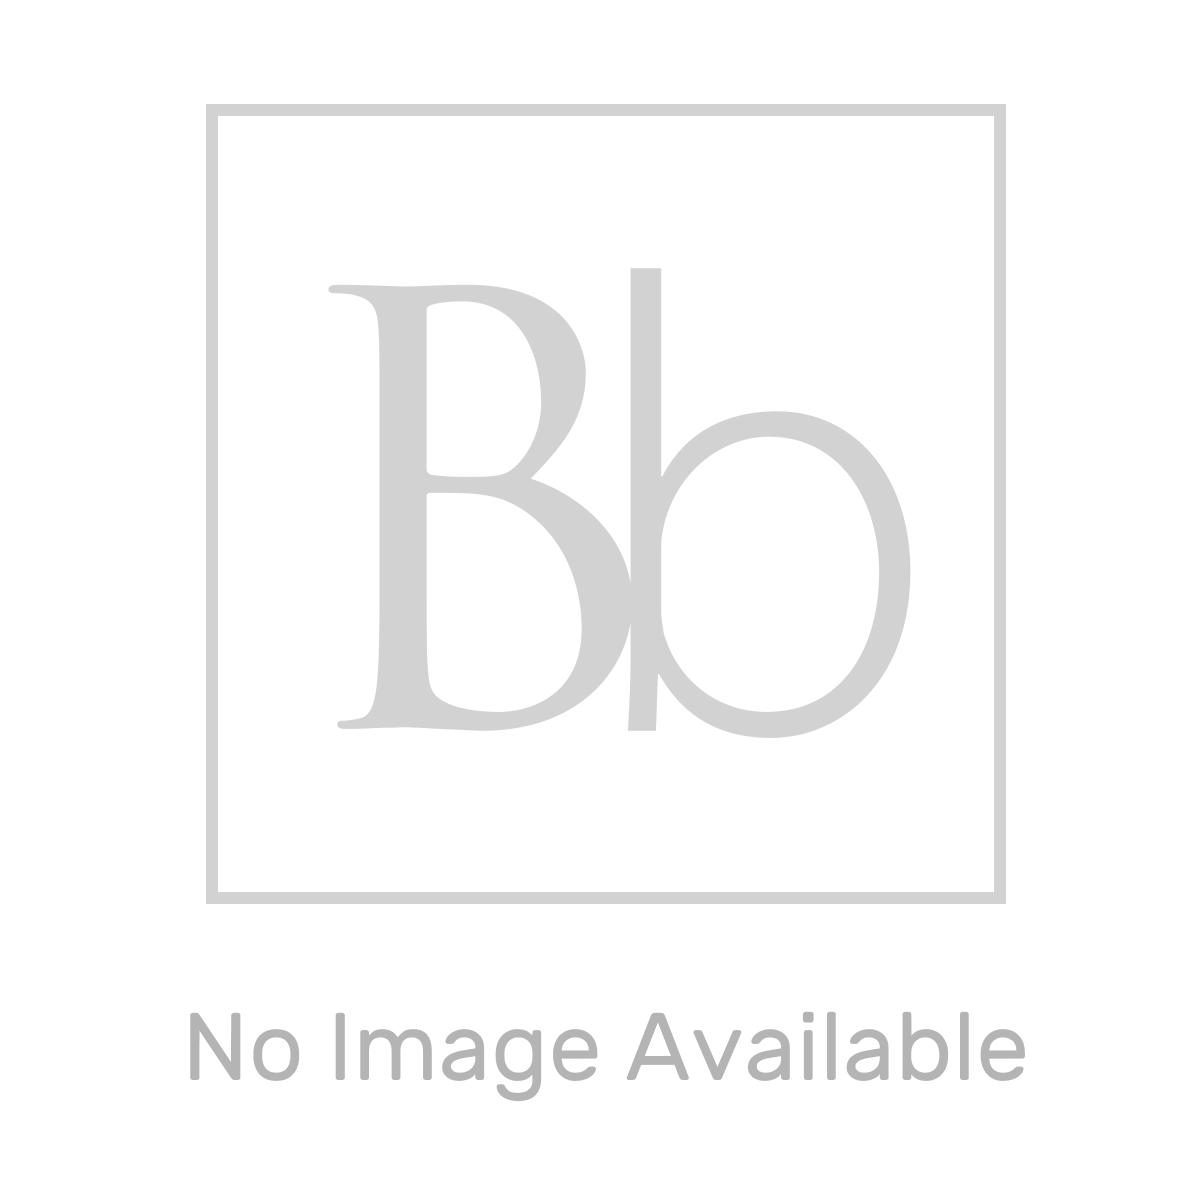 Kartell K-VIT Korsika Close Coupled Toilet with Soft Close Seat 1